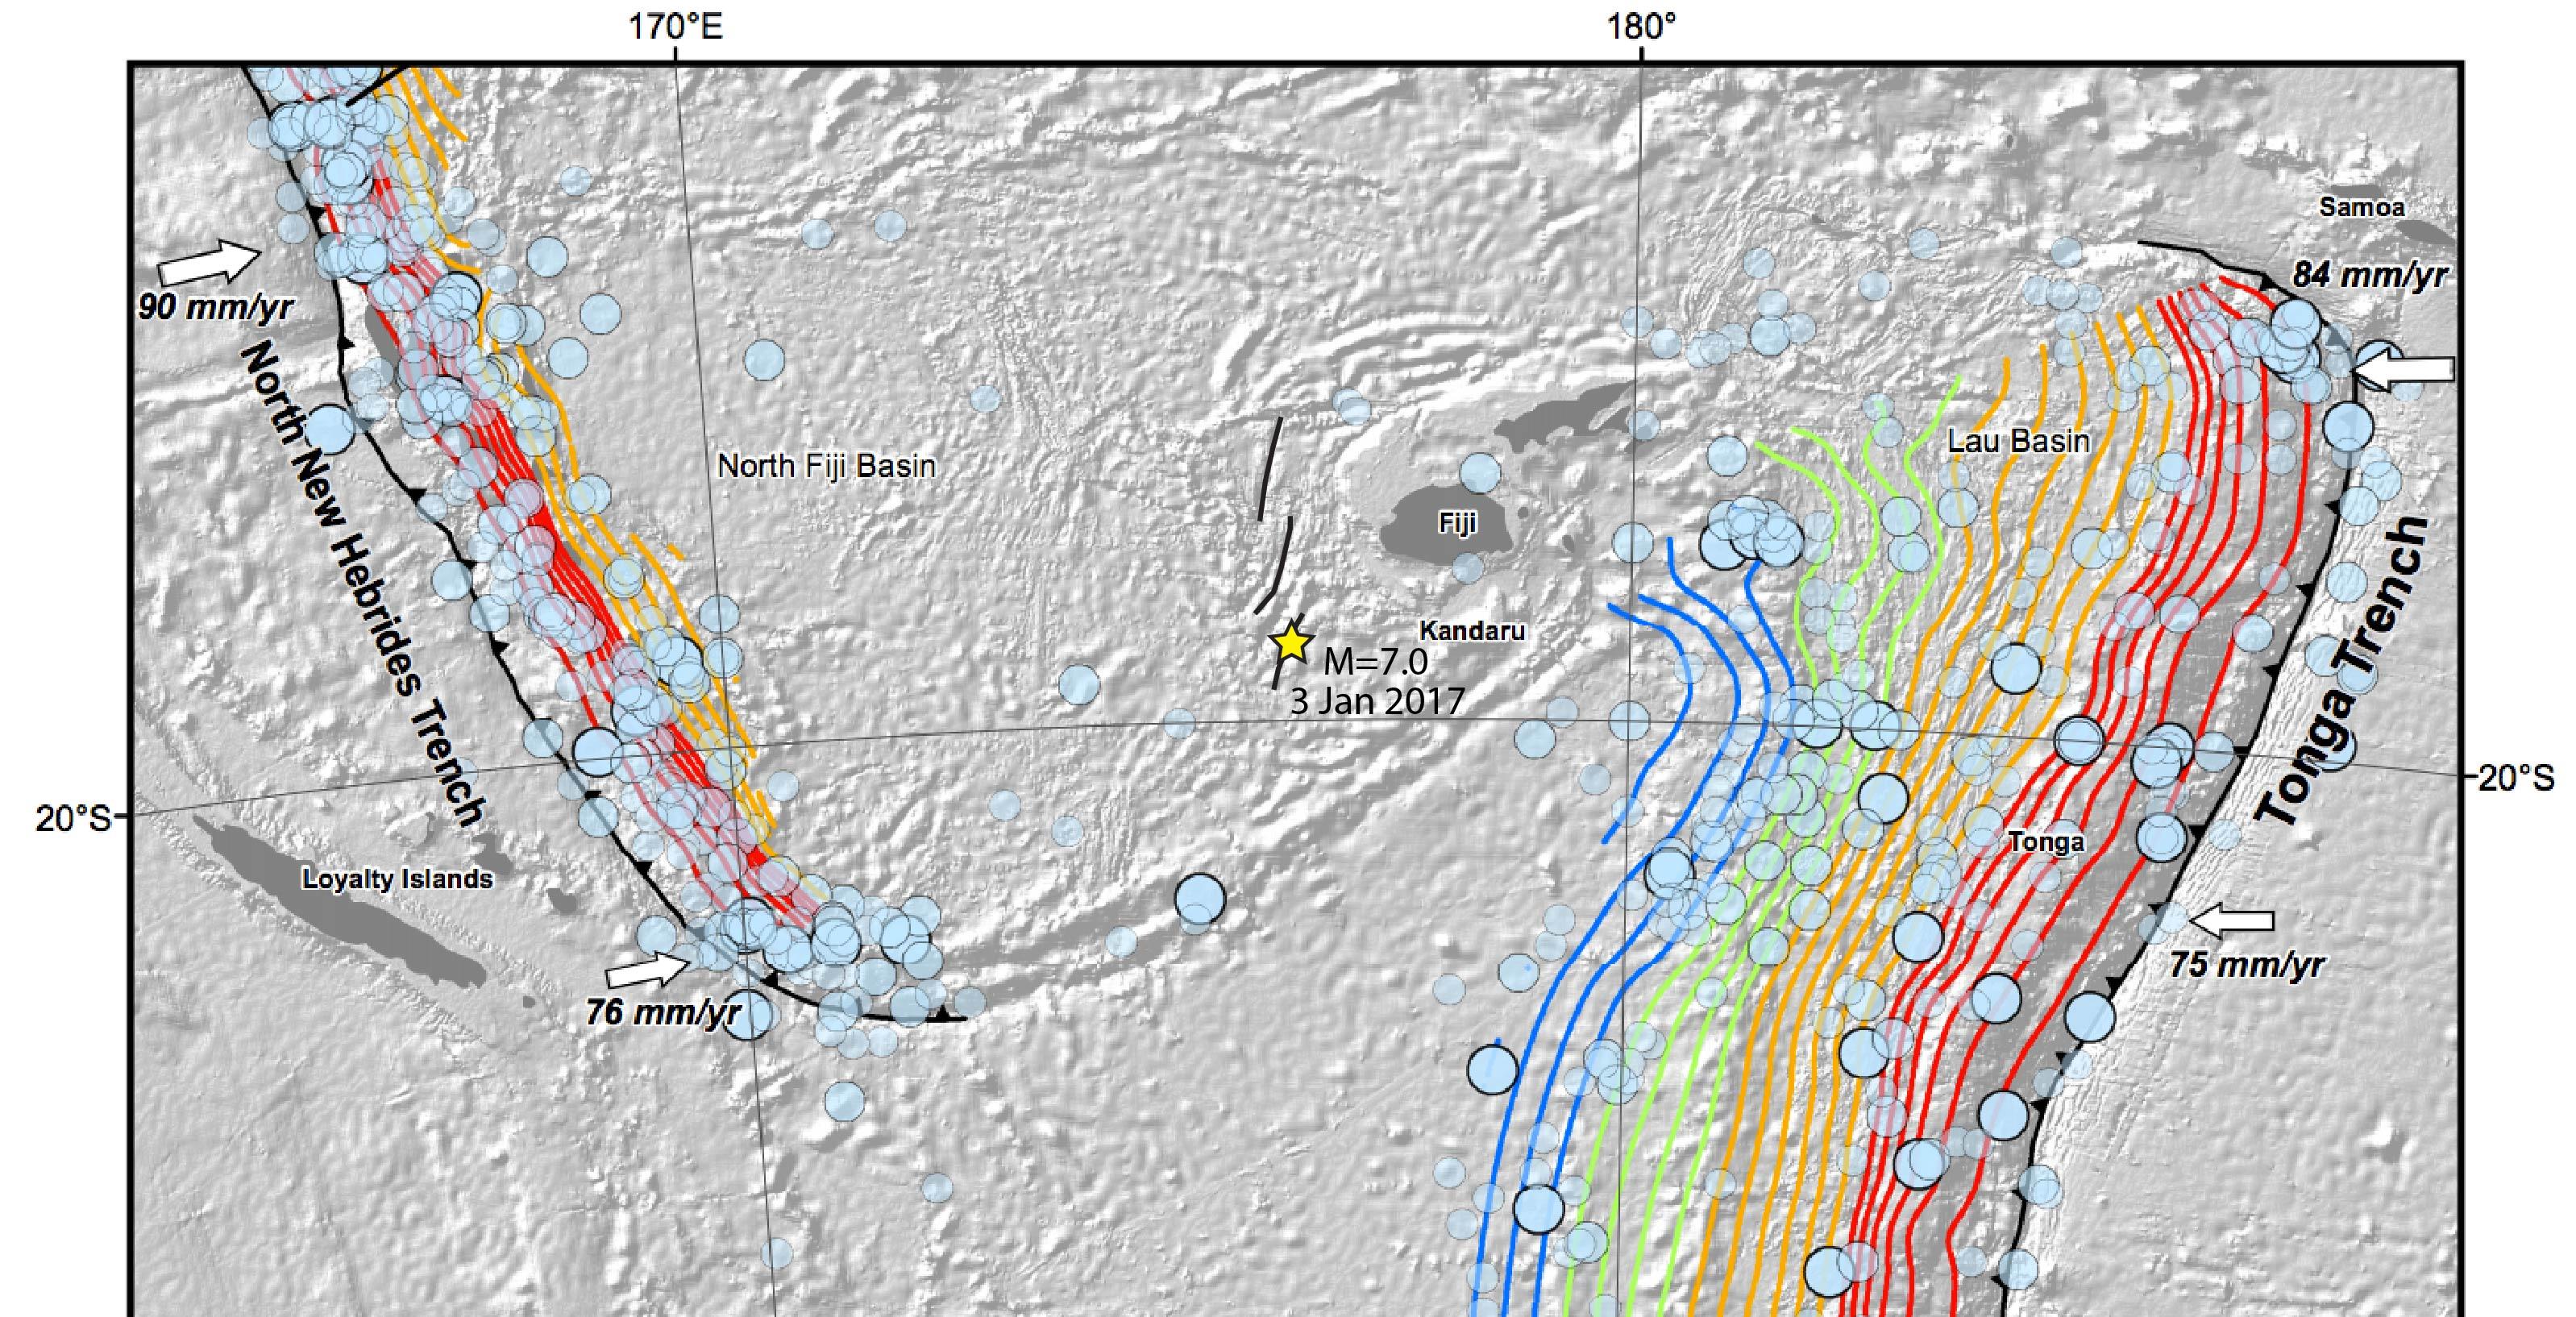 fiji-earthquake-regional-structural-earthquake-map